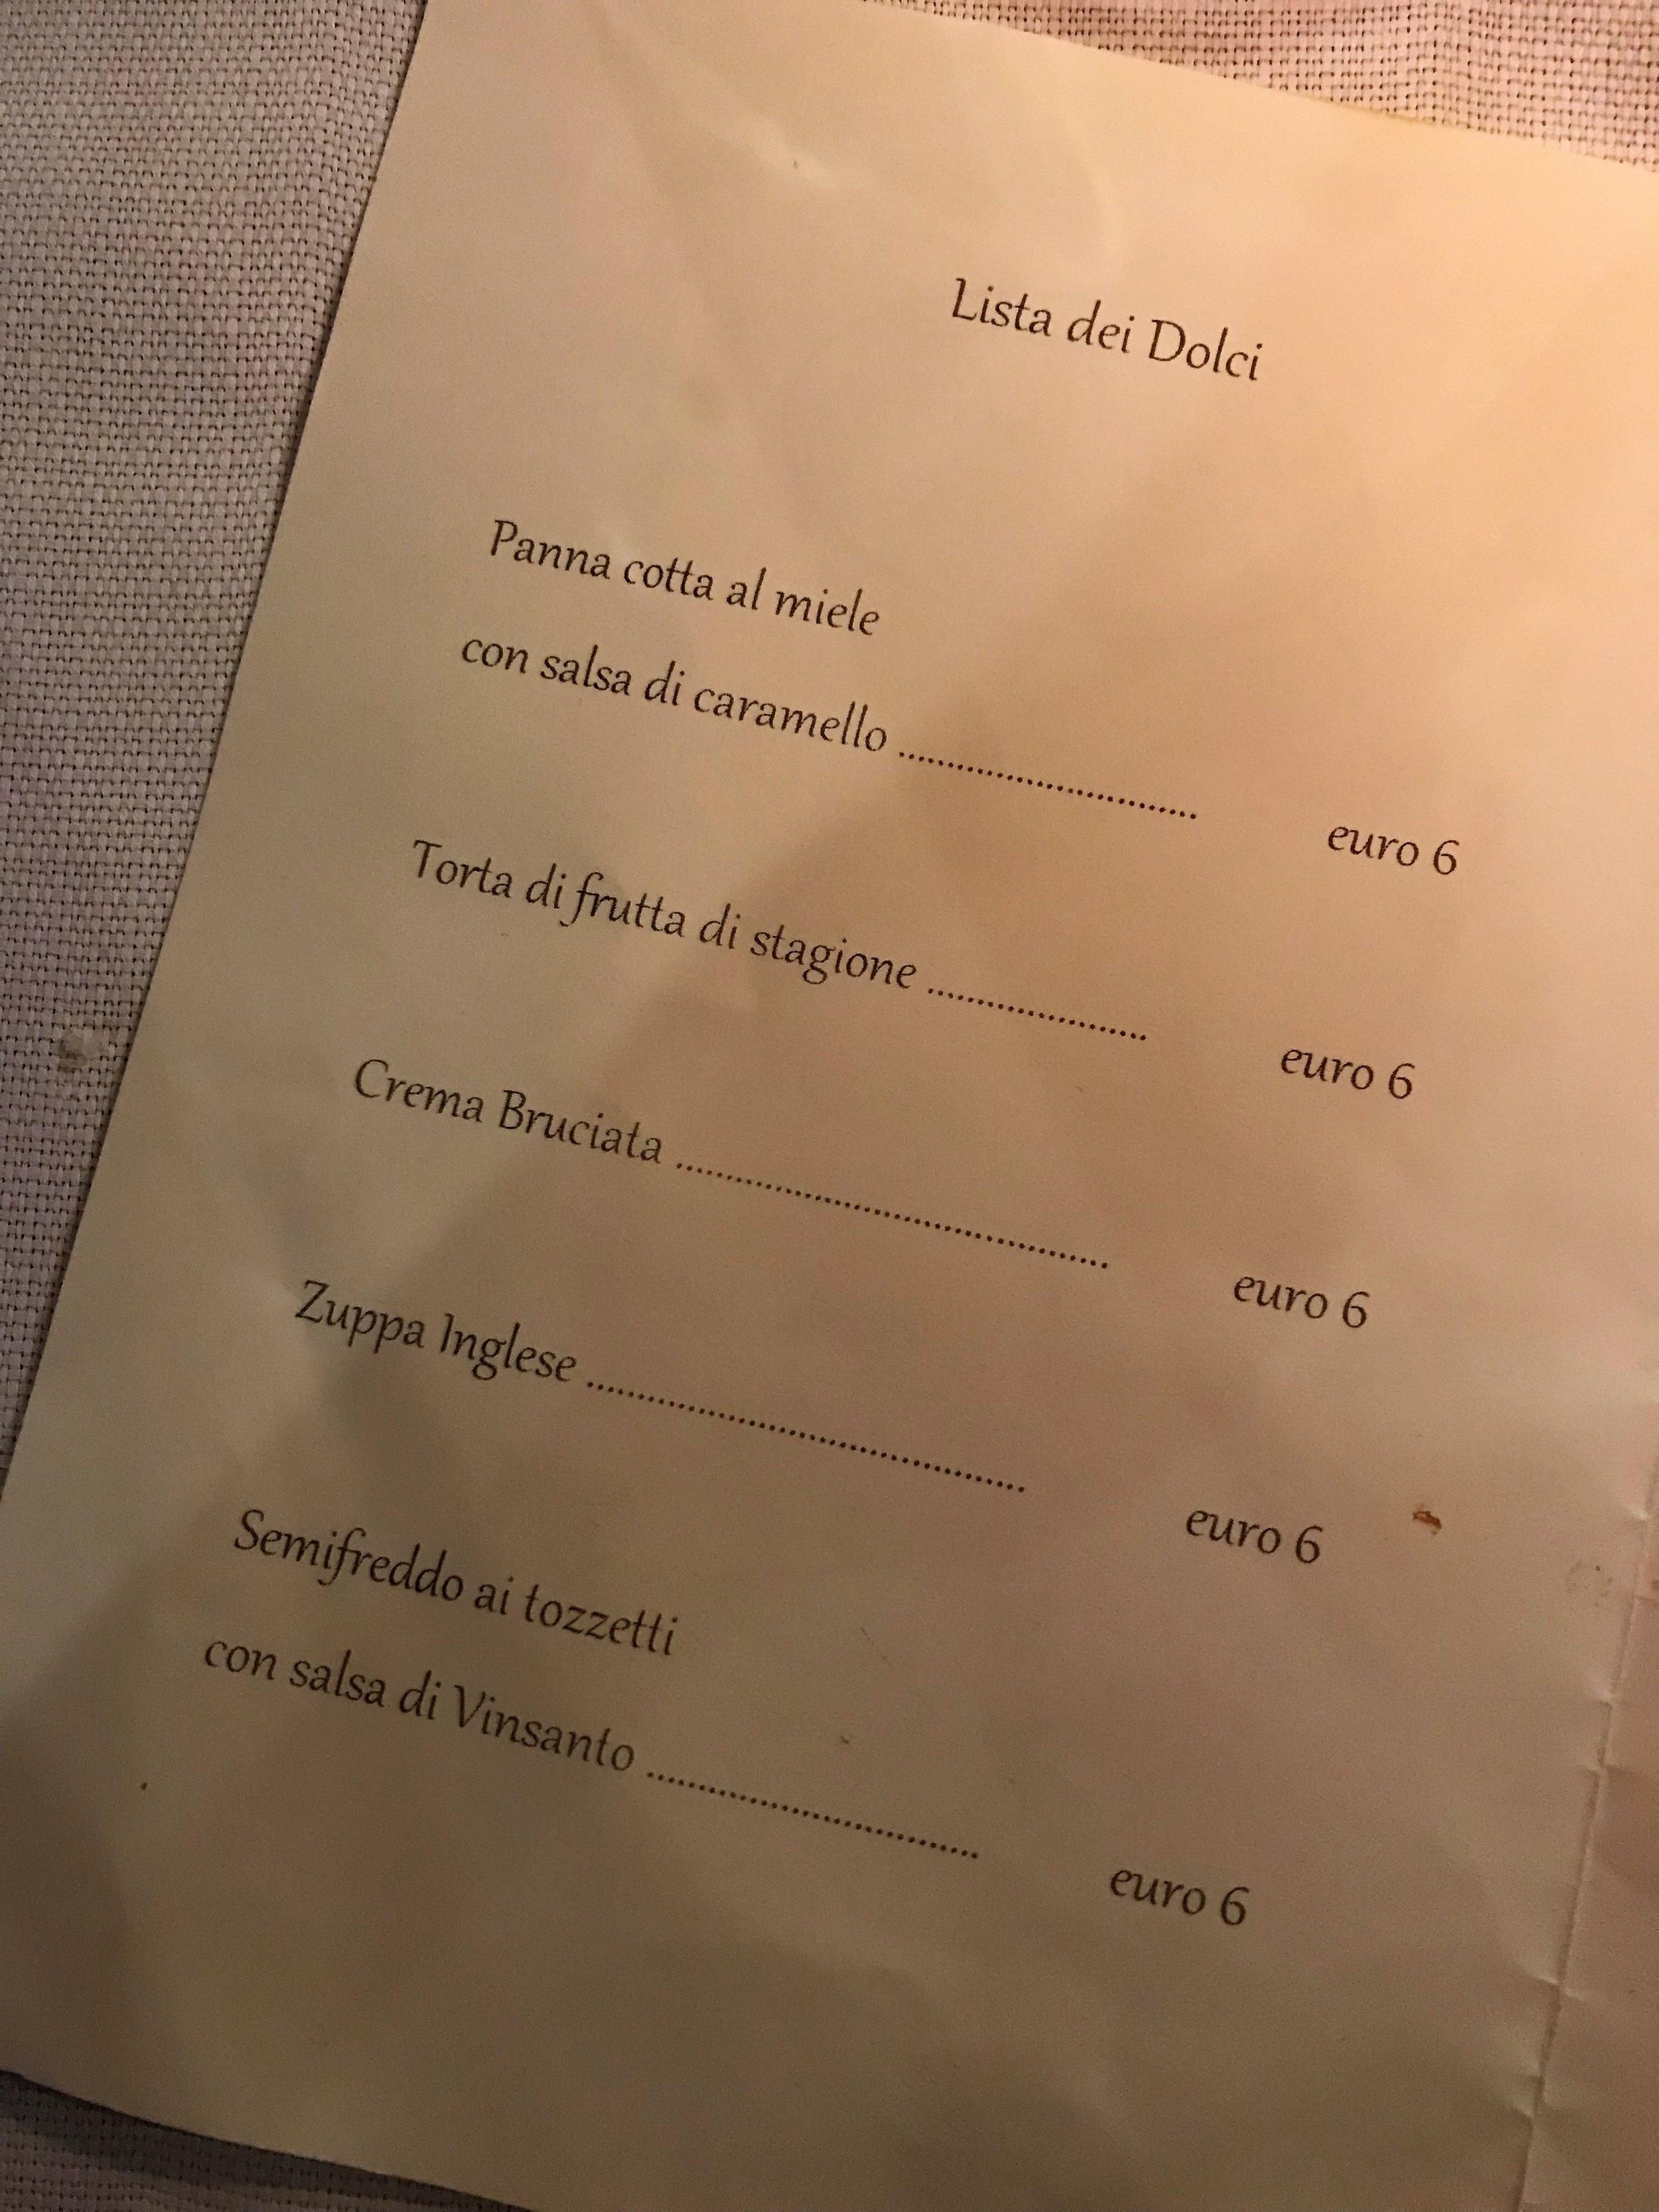 Dessert choices